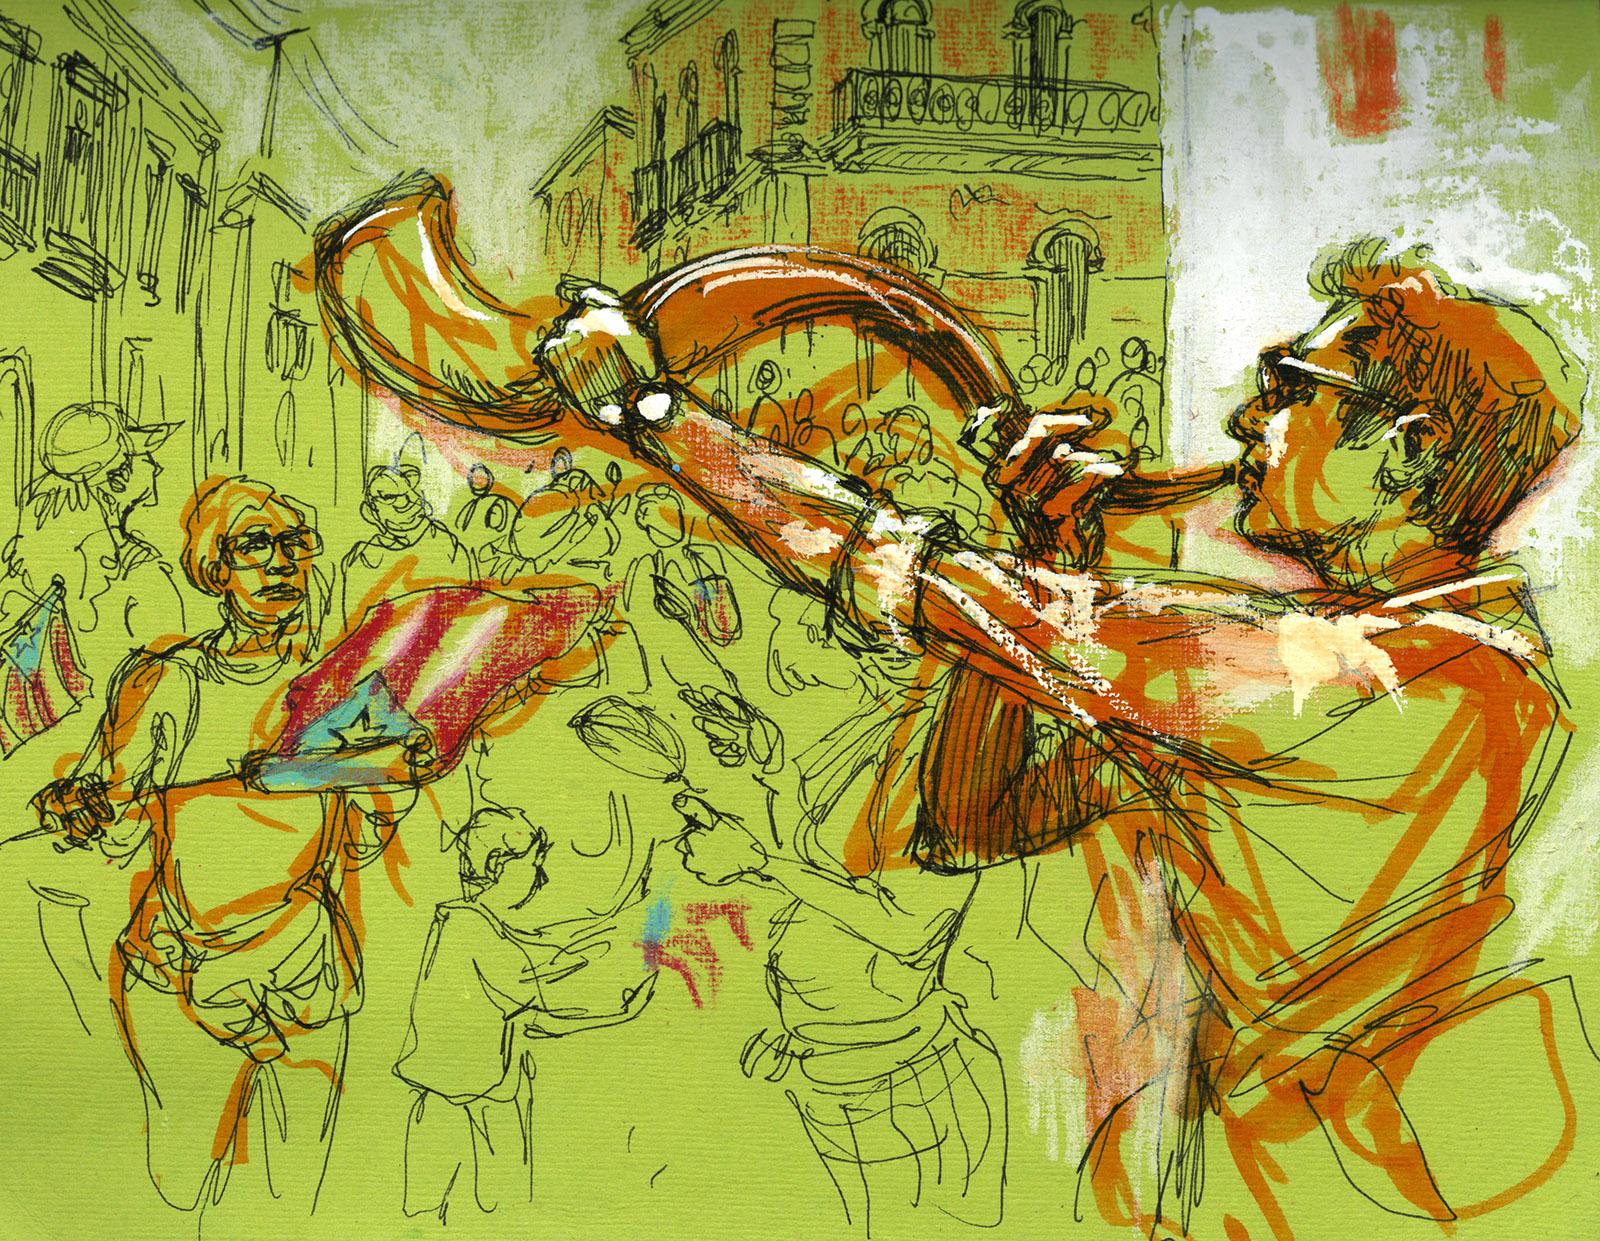 Noel blowing his shofar at the demonstrations celebrating Governor Ricardo Rosselló's resignation, San Juan, August 2, 2019